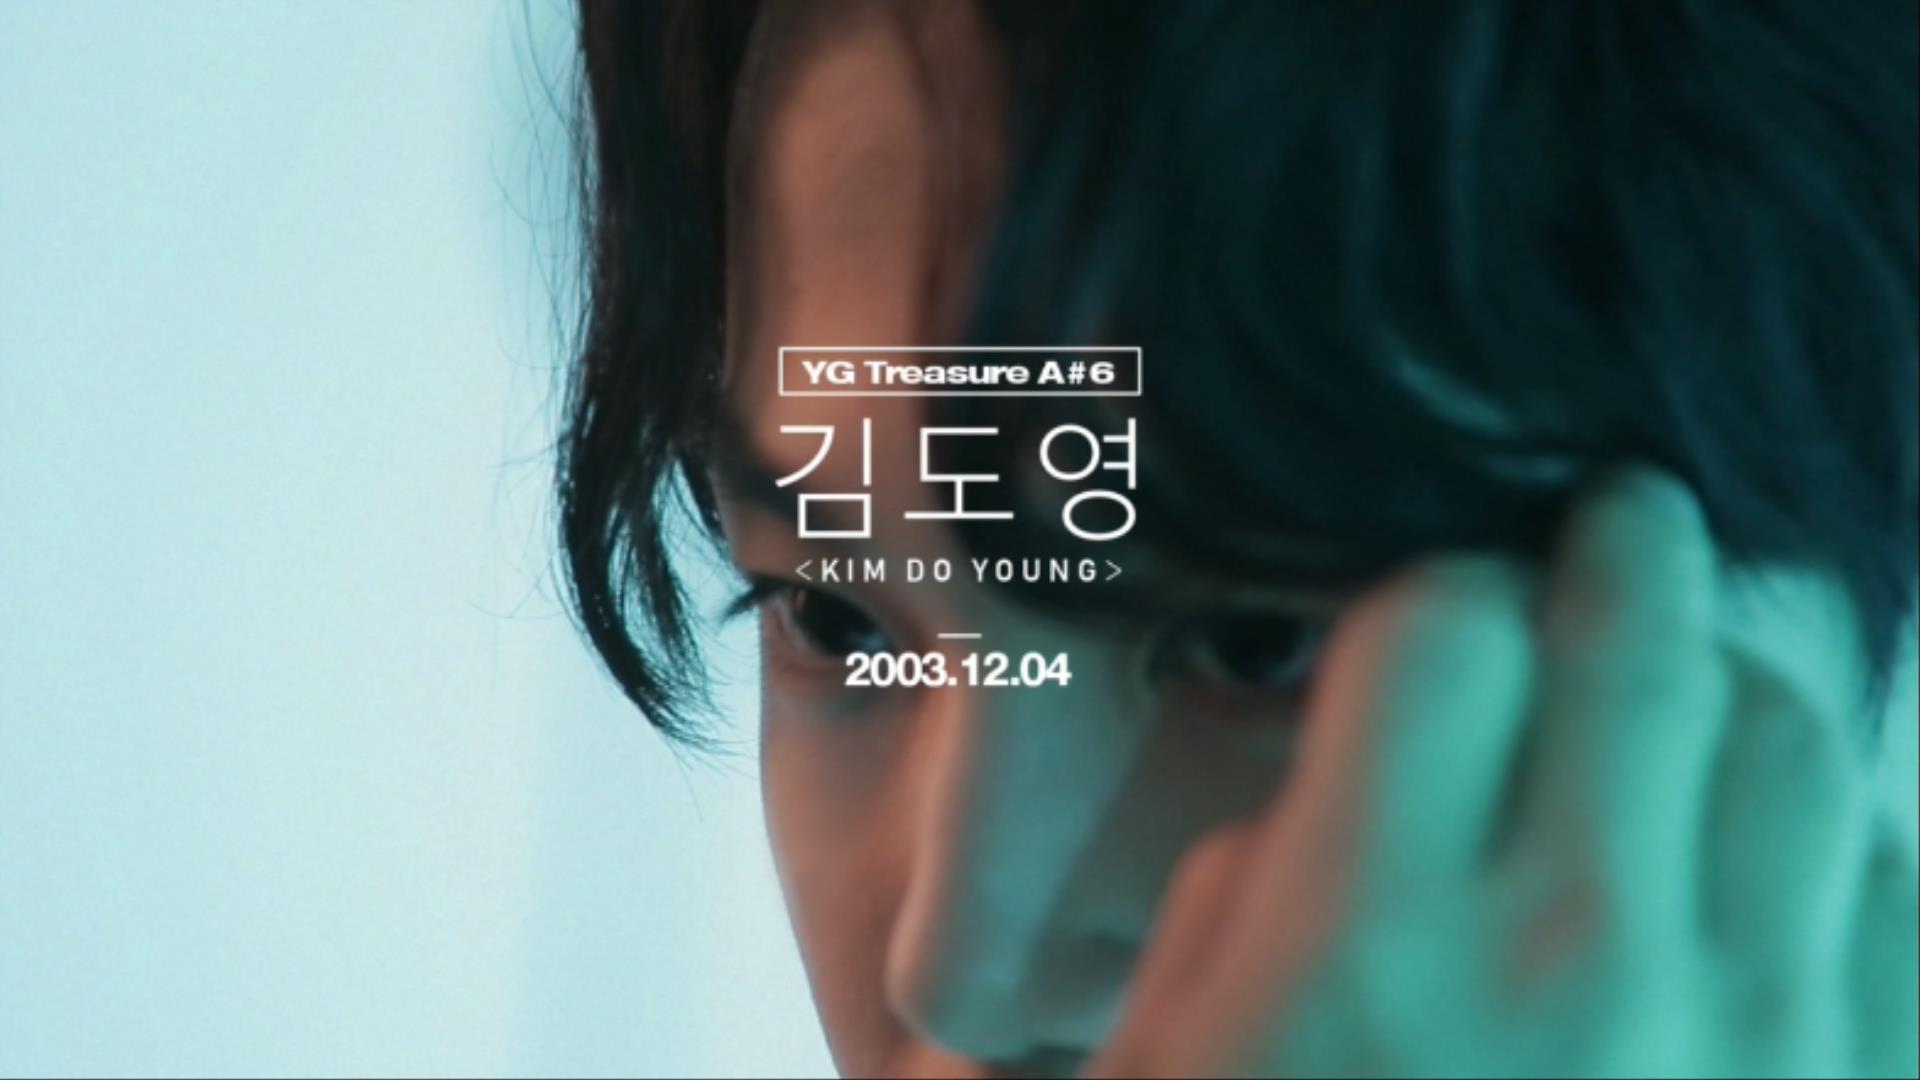 YG보석함ㅣA#6 김도영 <KIM DOYOUNG> PROFILE MAKING FILM